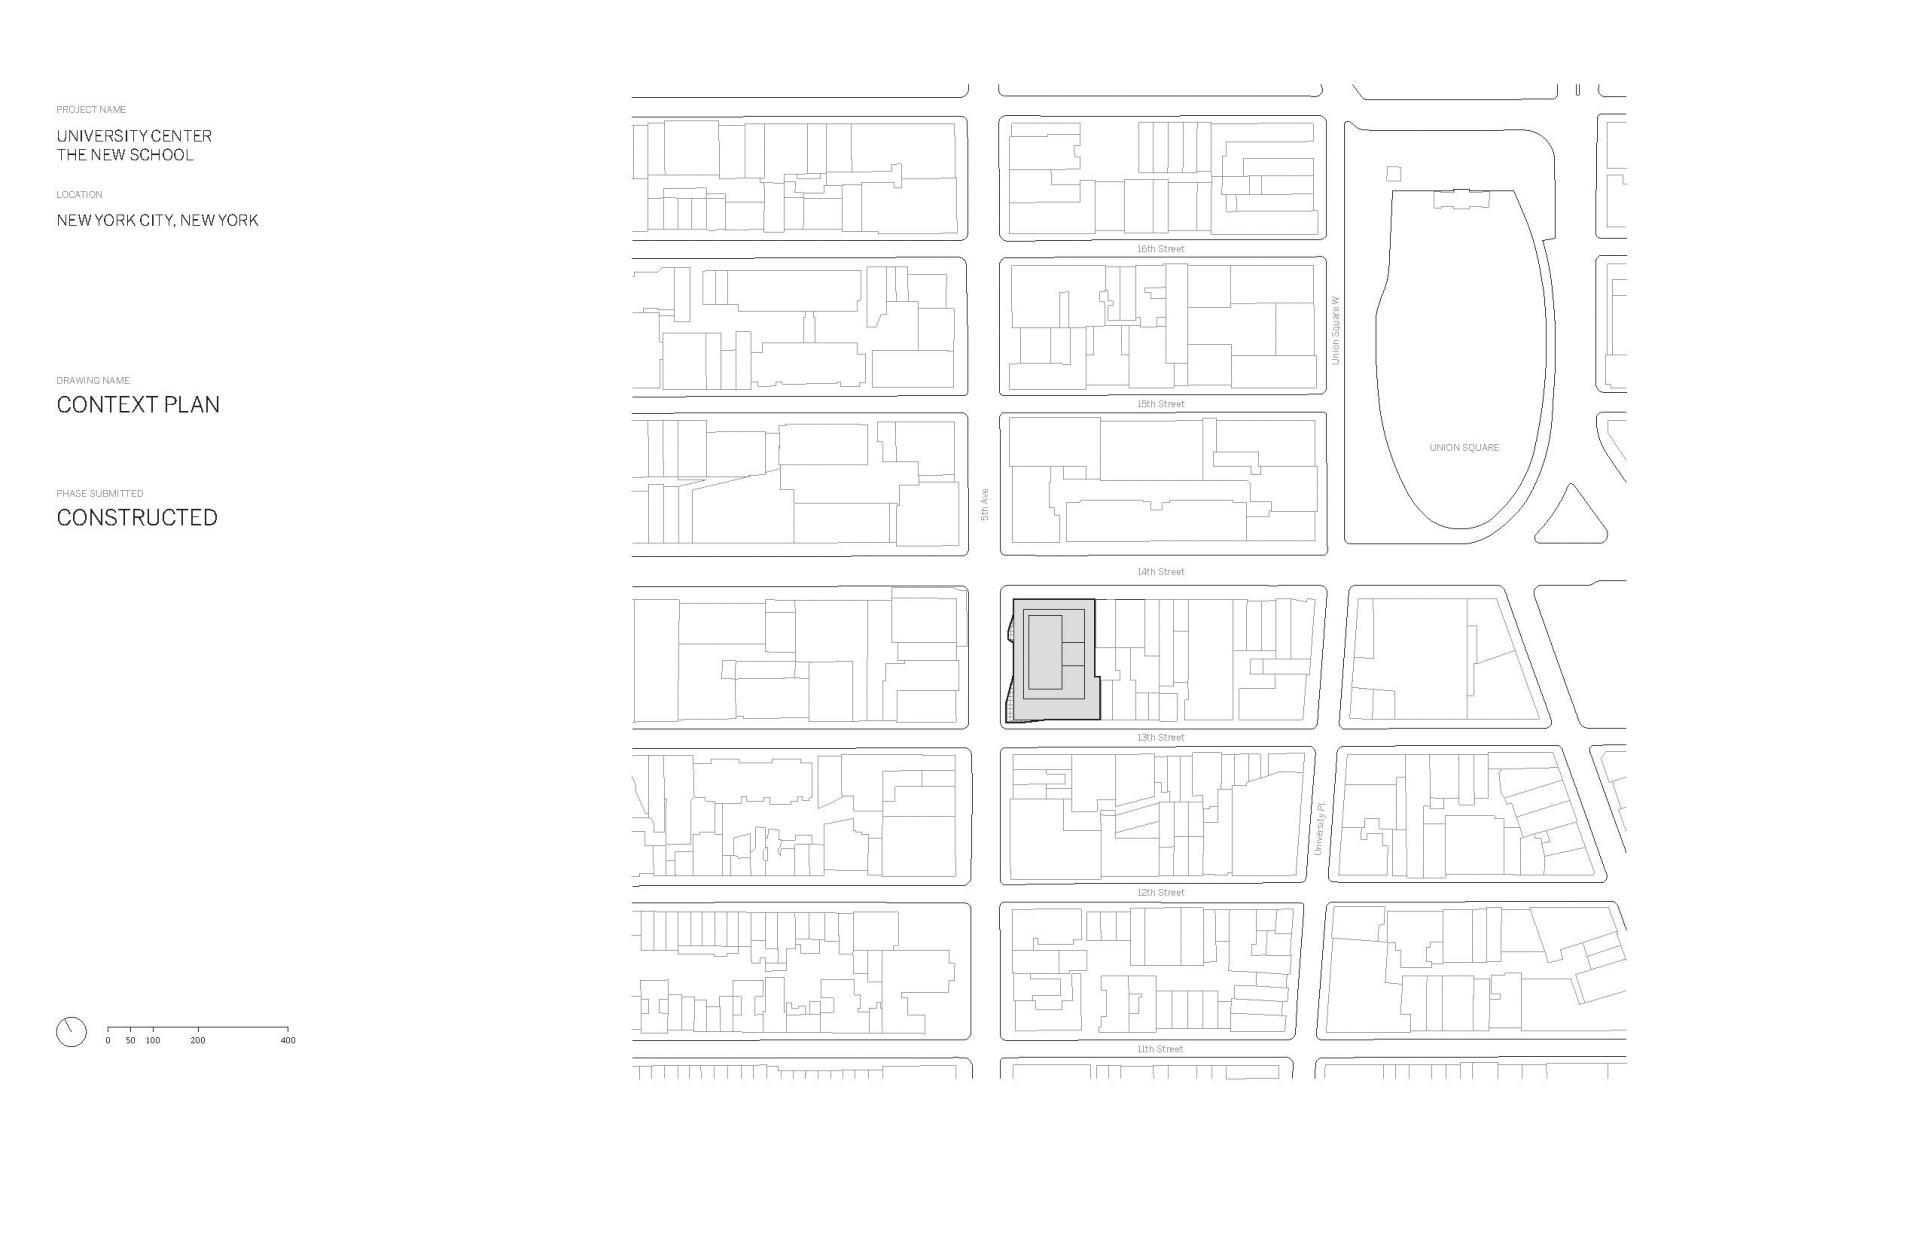 Схема учебного центра Greenwich Village в Нью Йорке - Фото 1